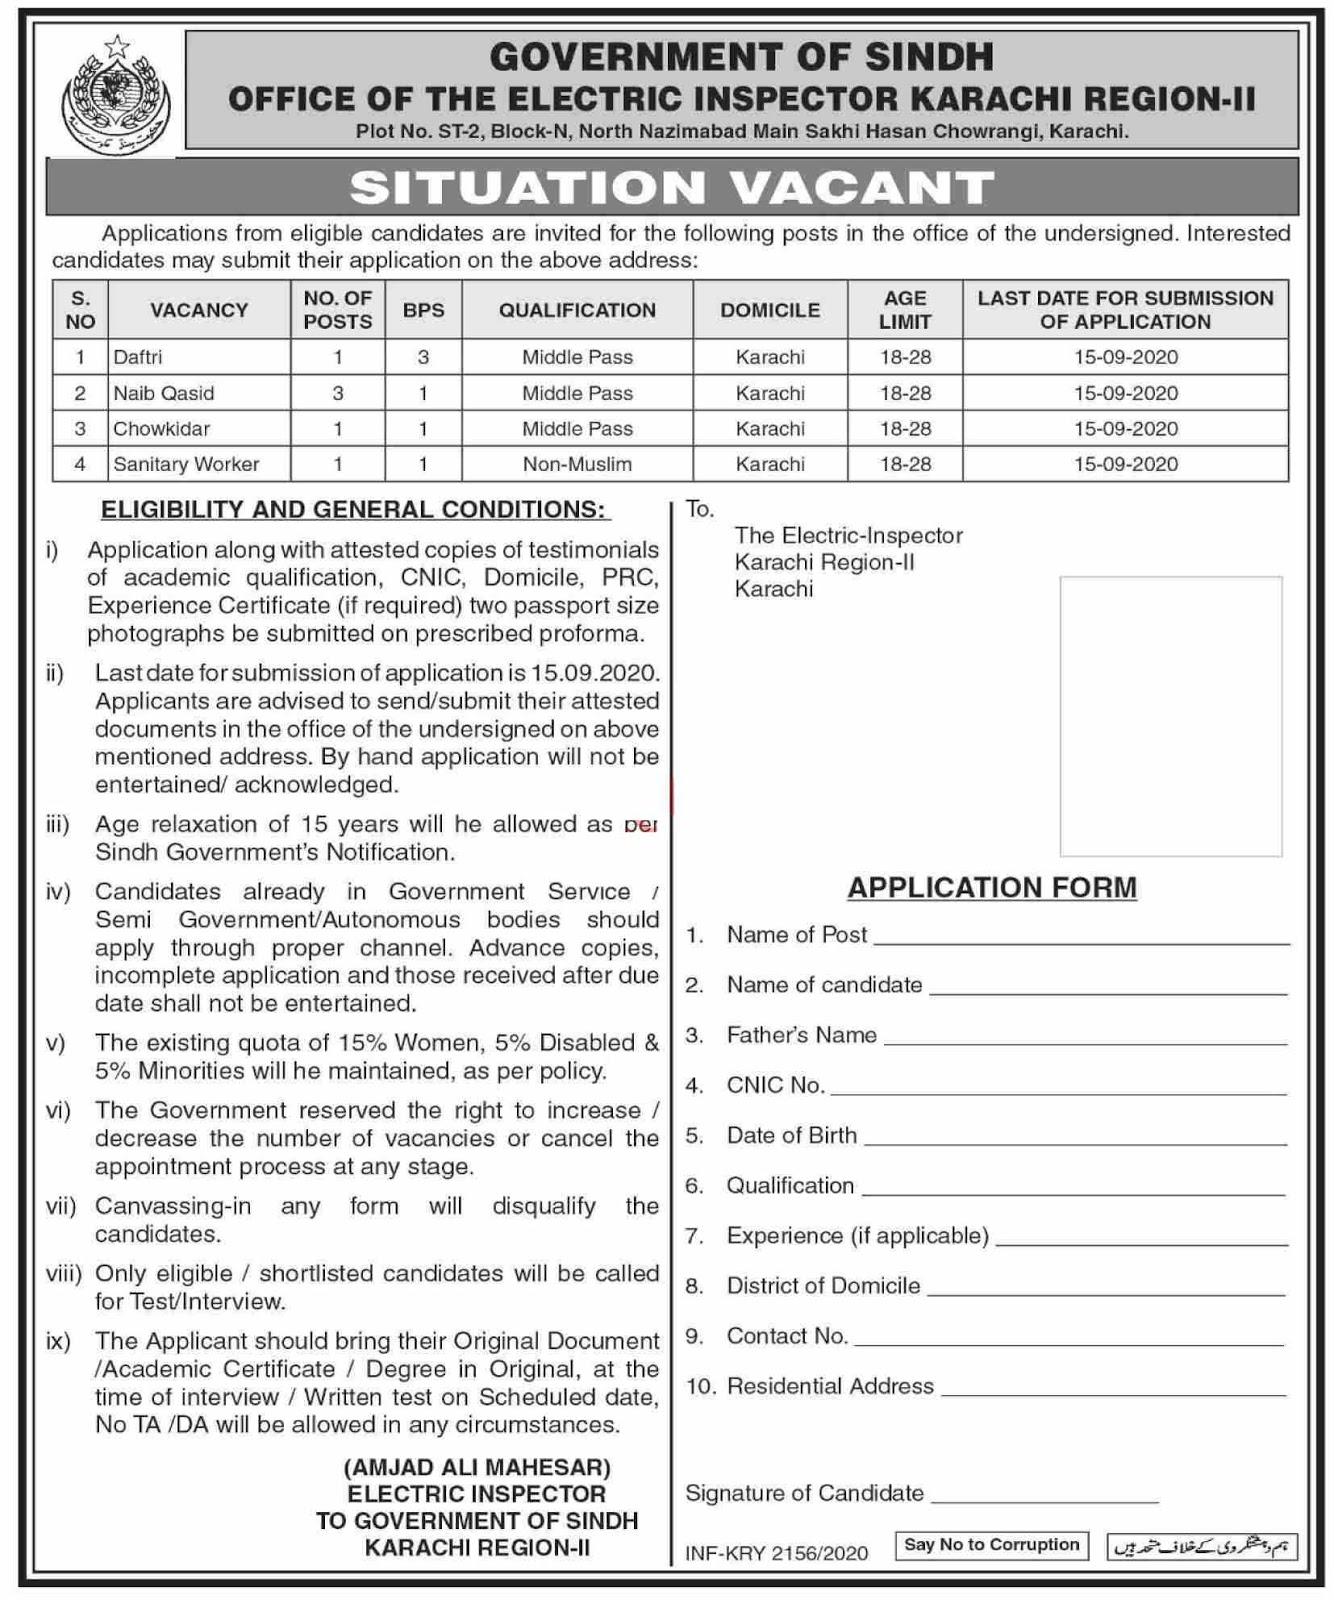 Office of the Electric Inspector Karachi Region Jobs 2020